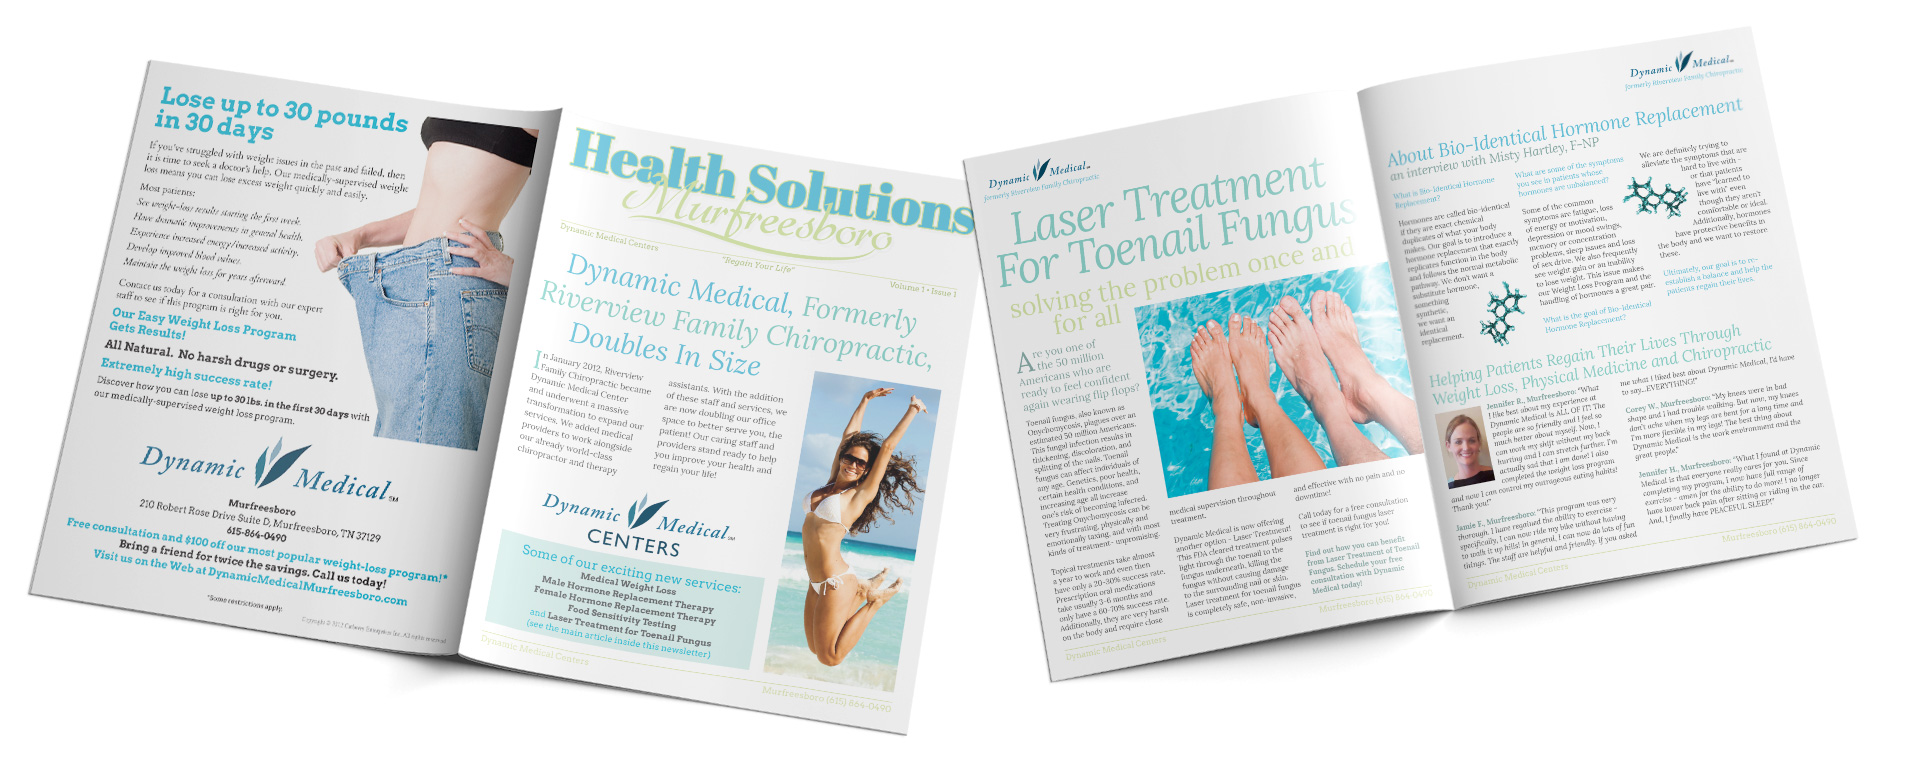 health-solution-murf-newsletter-wide-on-white.jpg